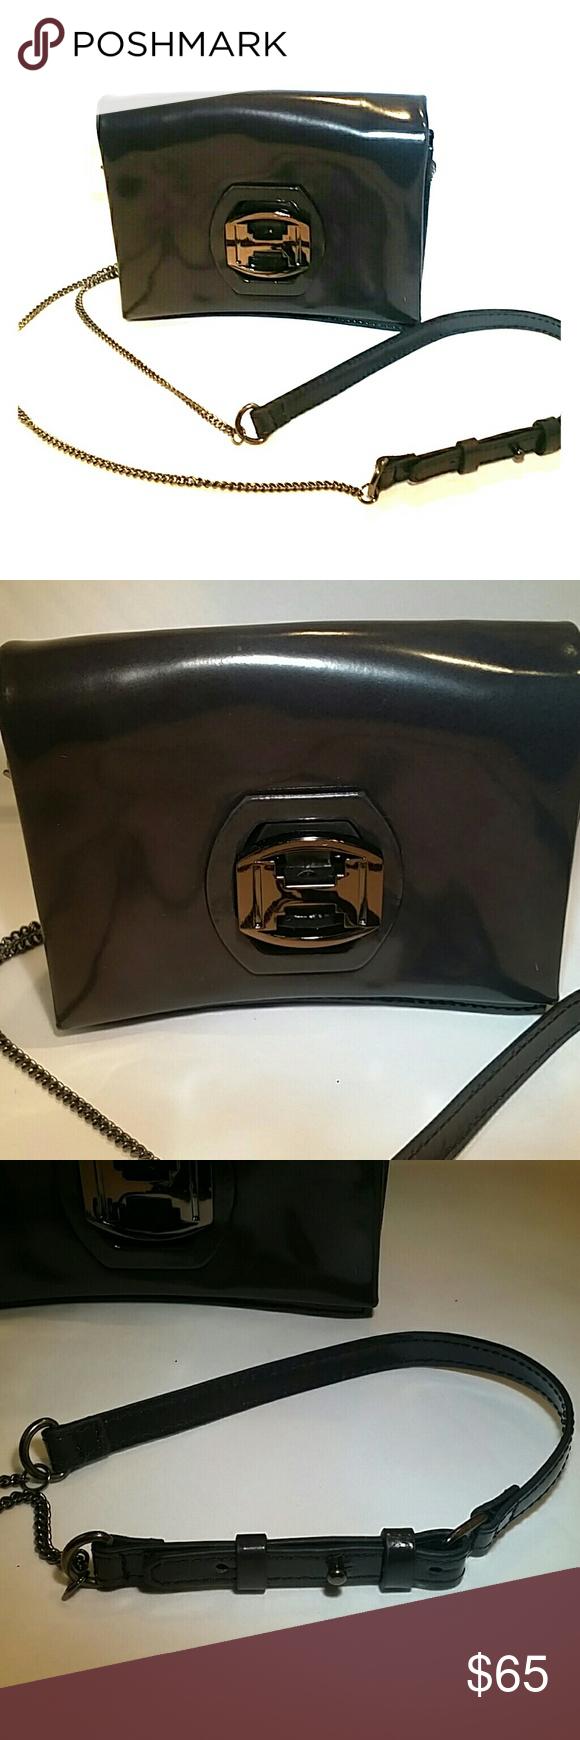 c2ede956909 Halston Heritage Gunmetal Crossbody Bag Beautiful, barely worn, gunmetal,  crossbody evening bag.